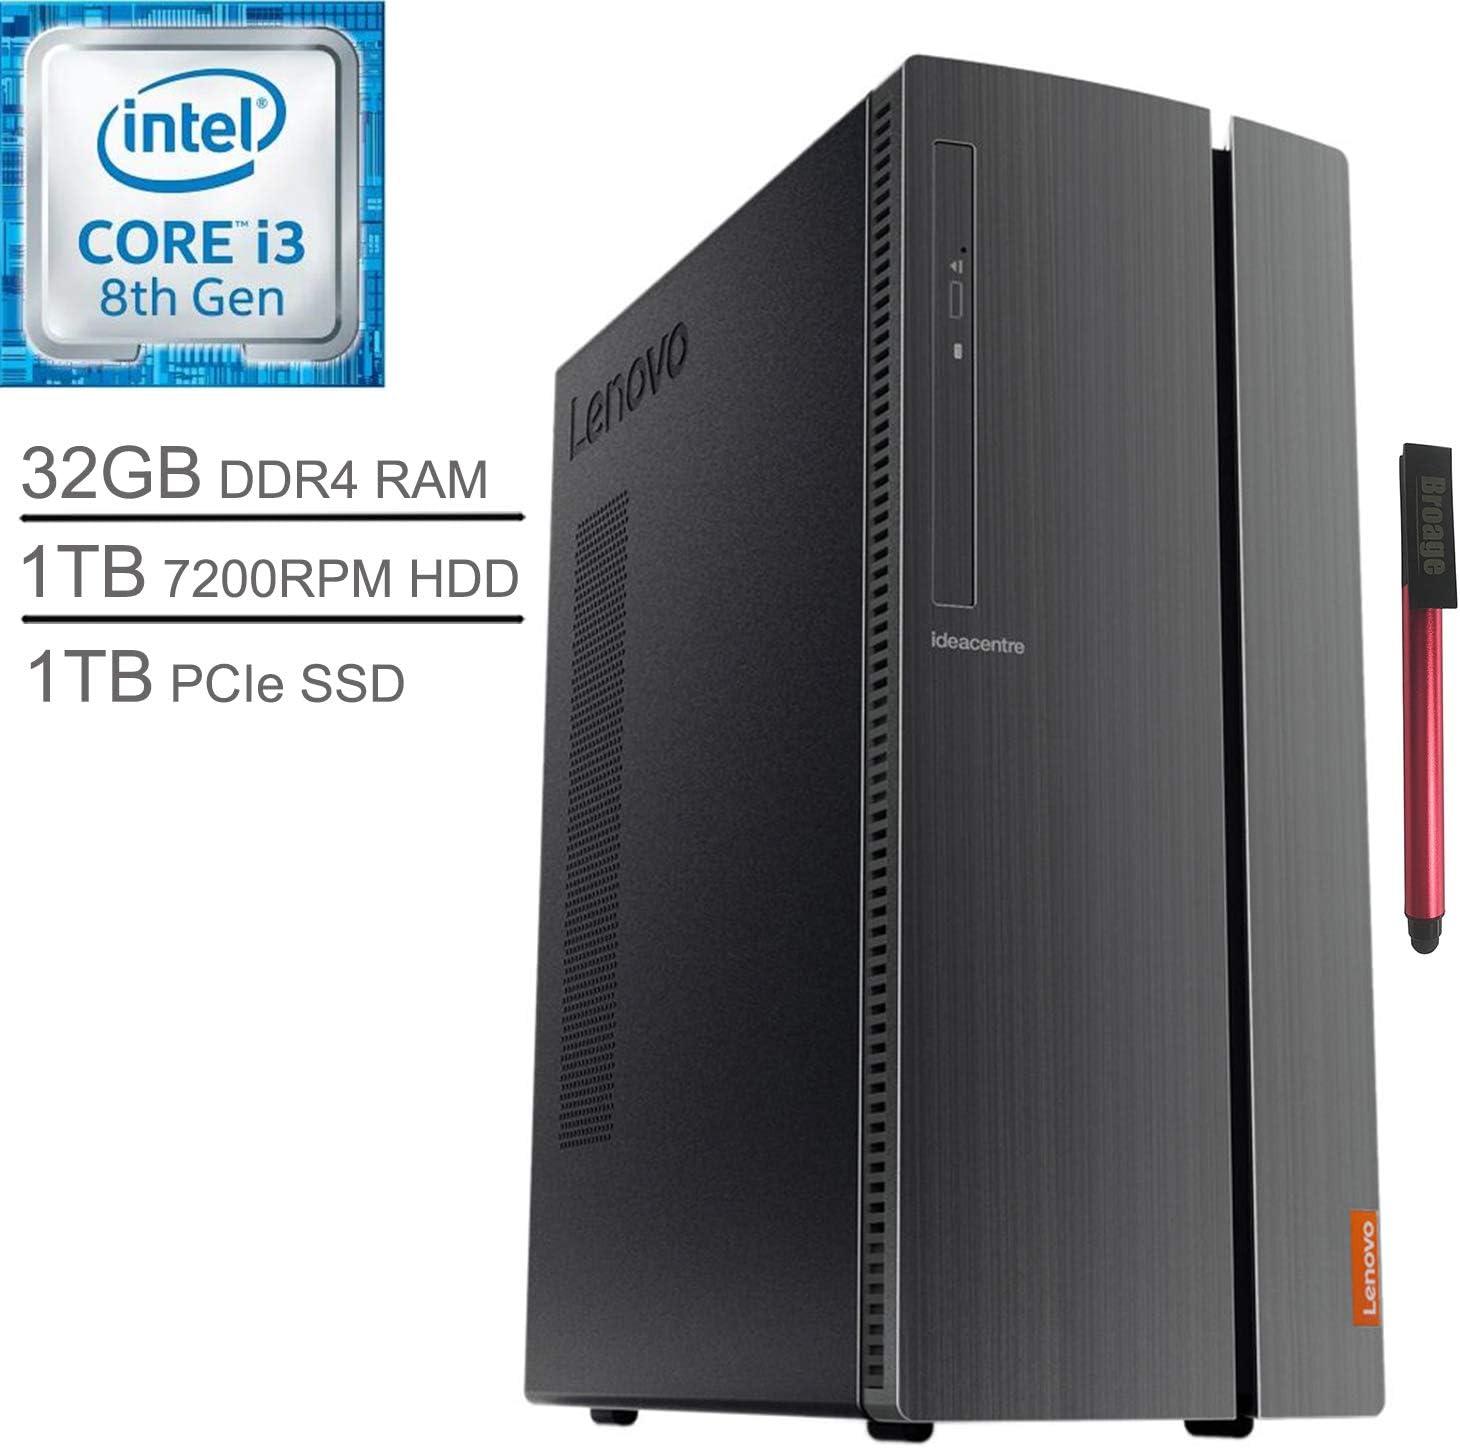 Lenovo IdeaCentre 510A Desktop Computer_ Intel Quad-Core i3-8100 3.6GHz (Beats i5-7500)_ 32GB DDR4 RAM_ 1TB 7200RPM HDD + 1TB PCIe SSD_ DVDRW_ 802.11AC WiFi_ Windows 10_ BROAGE 64GB Flash Drive